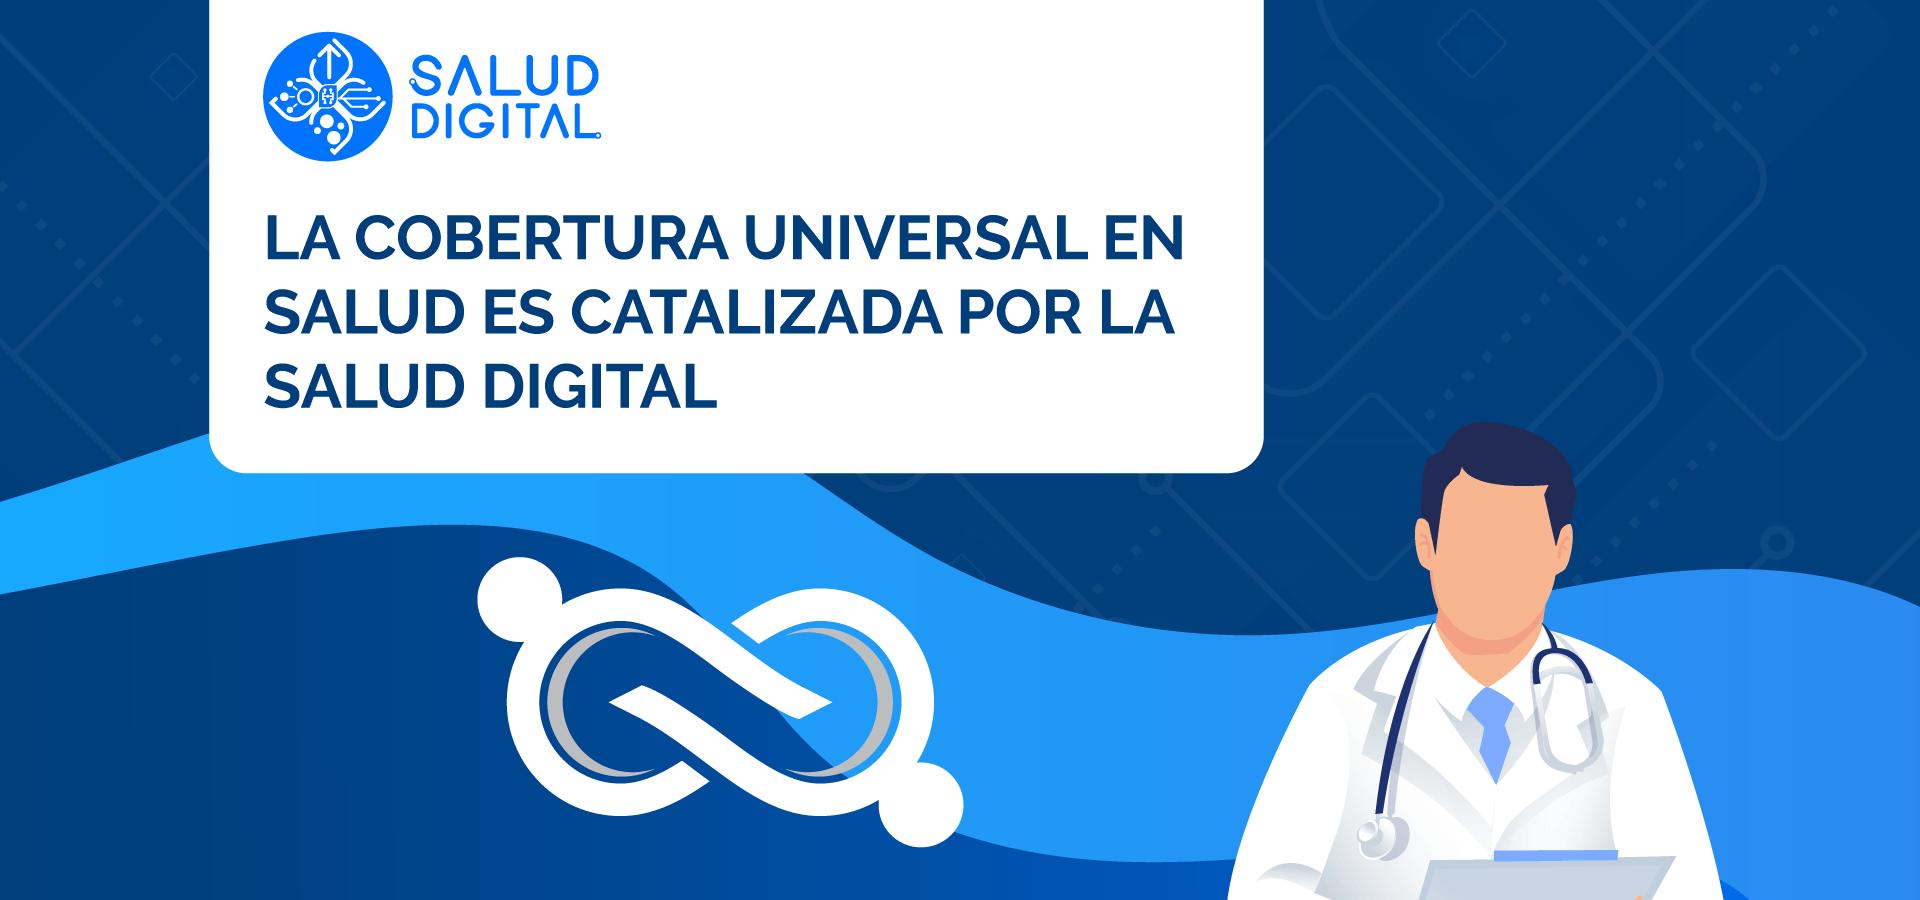 La-cobertura-universal-en-salud-es-catalizada-por-la-Salud-Digital-1920X900